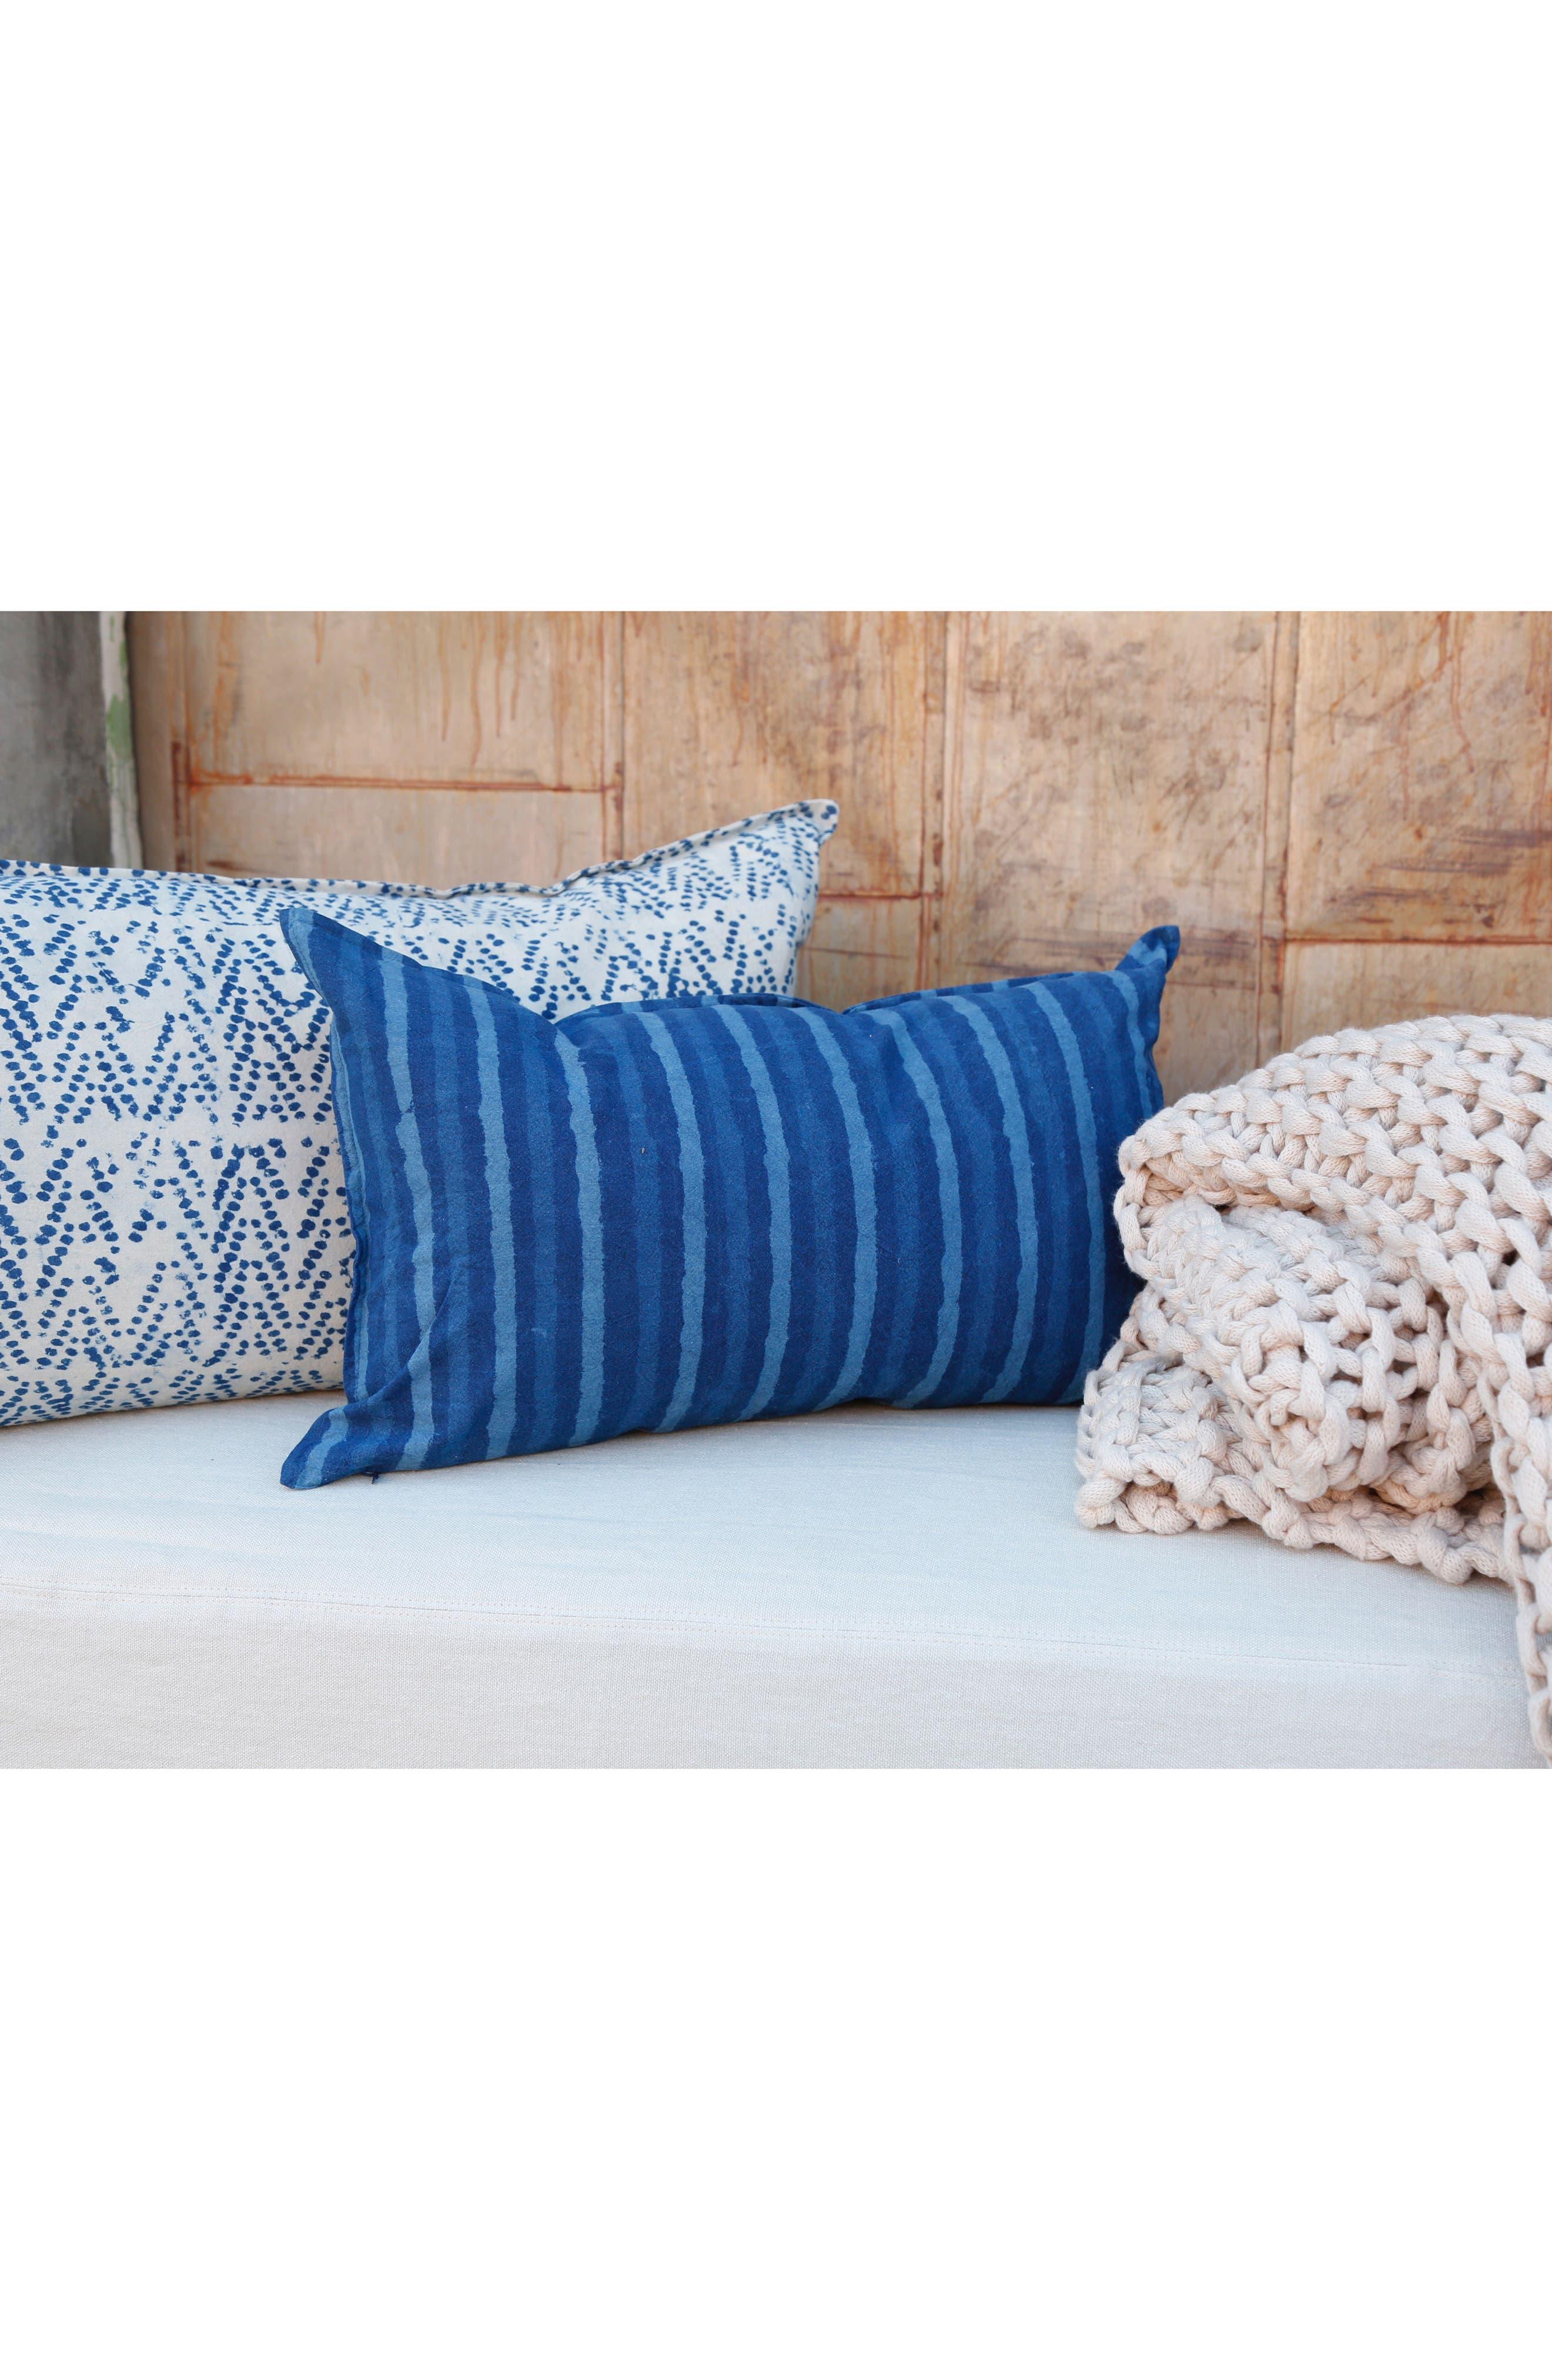 Indigo Dots Accent Pillow,                             Alternate thumbnail 2, color,